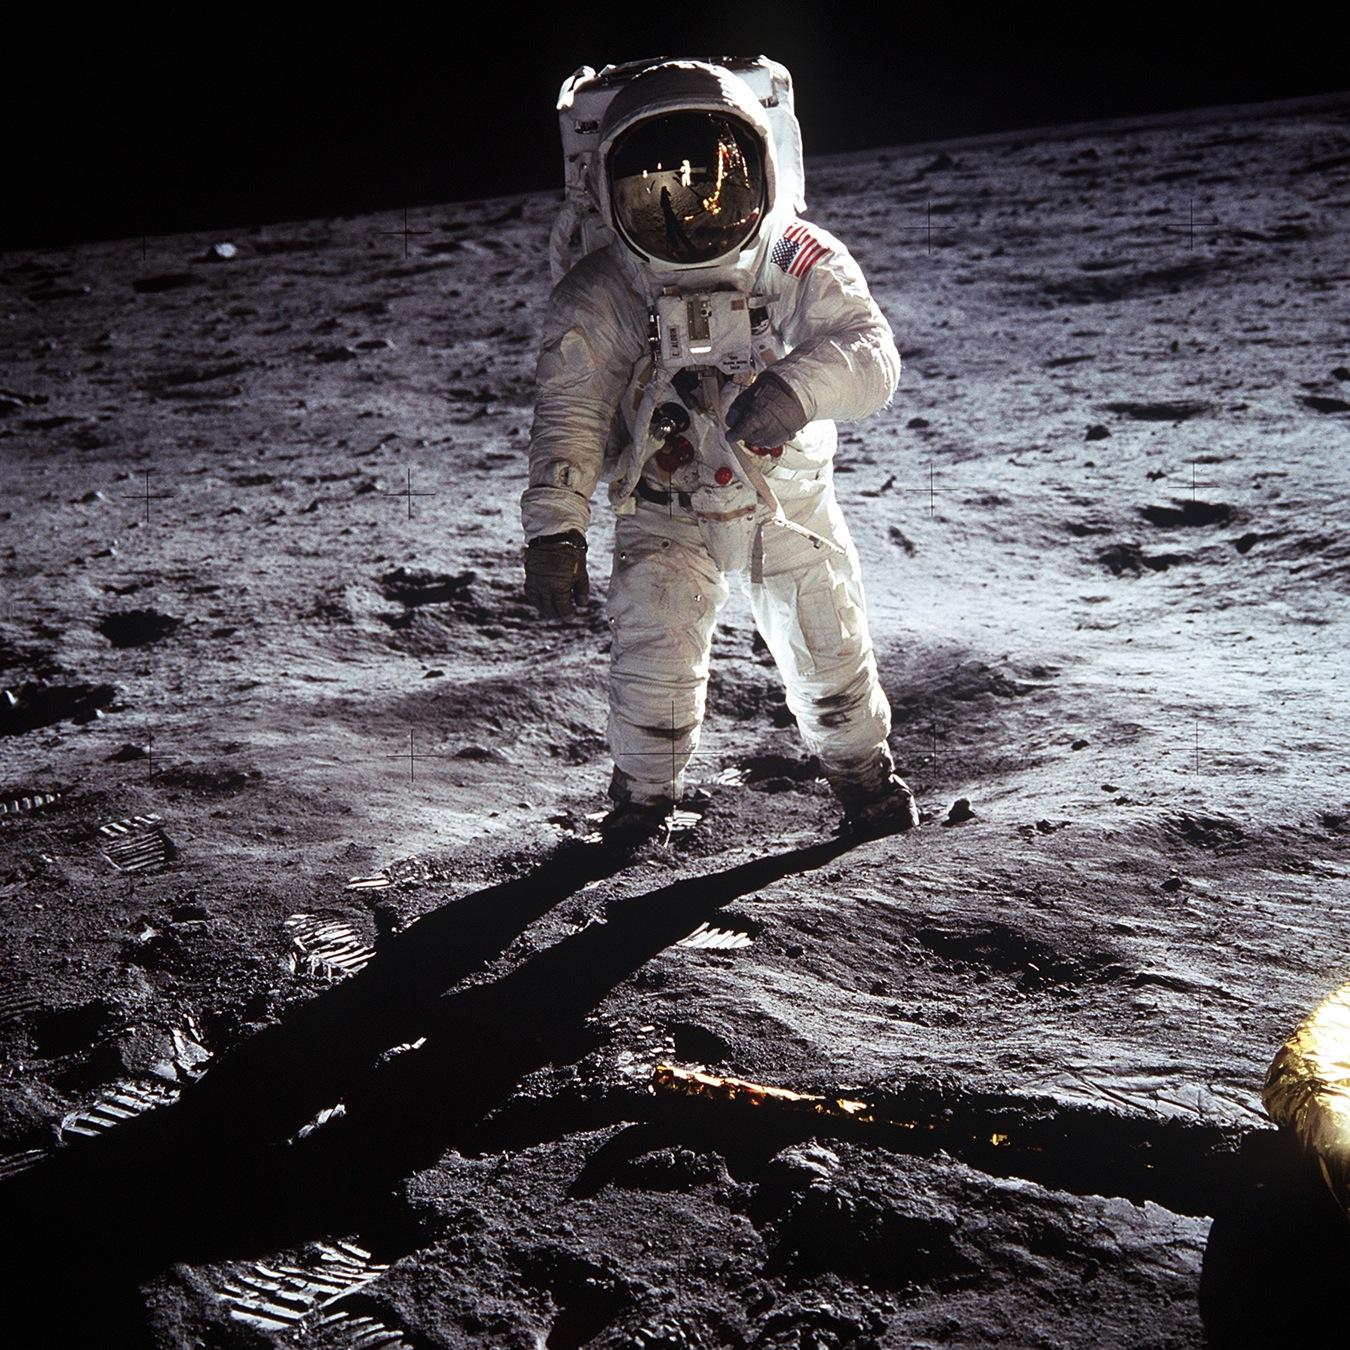 astronaut in maryland - photo #41